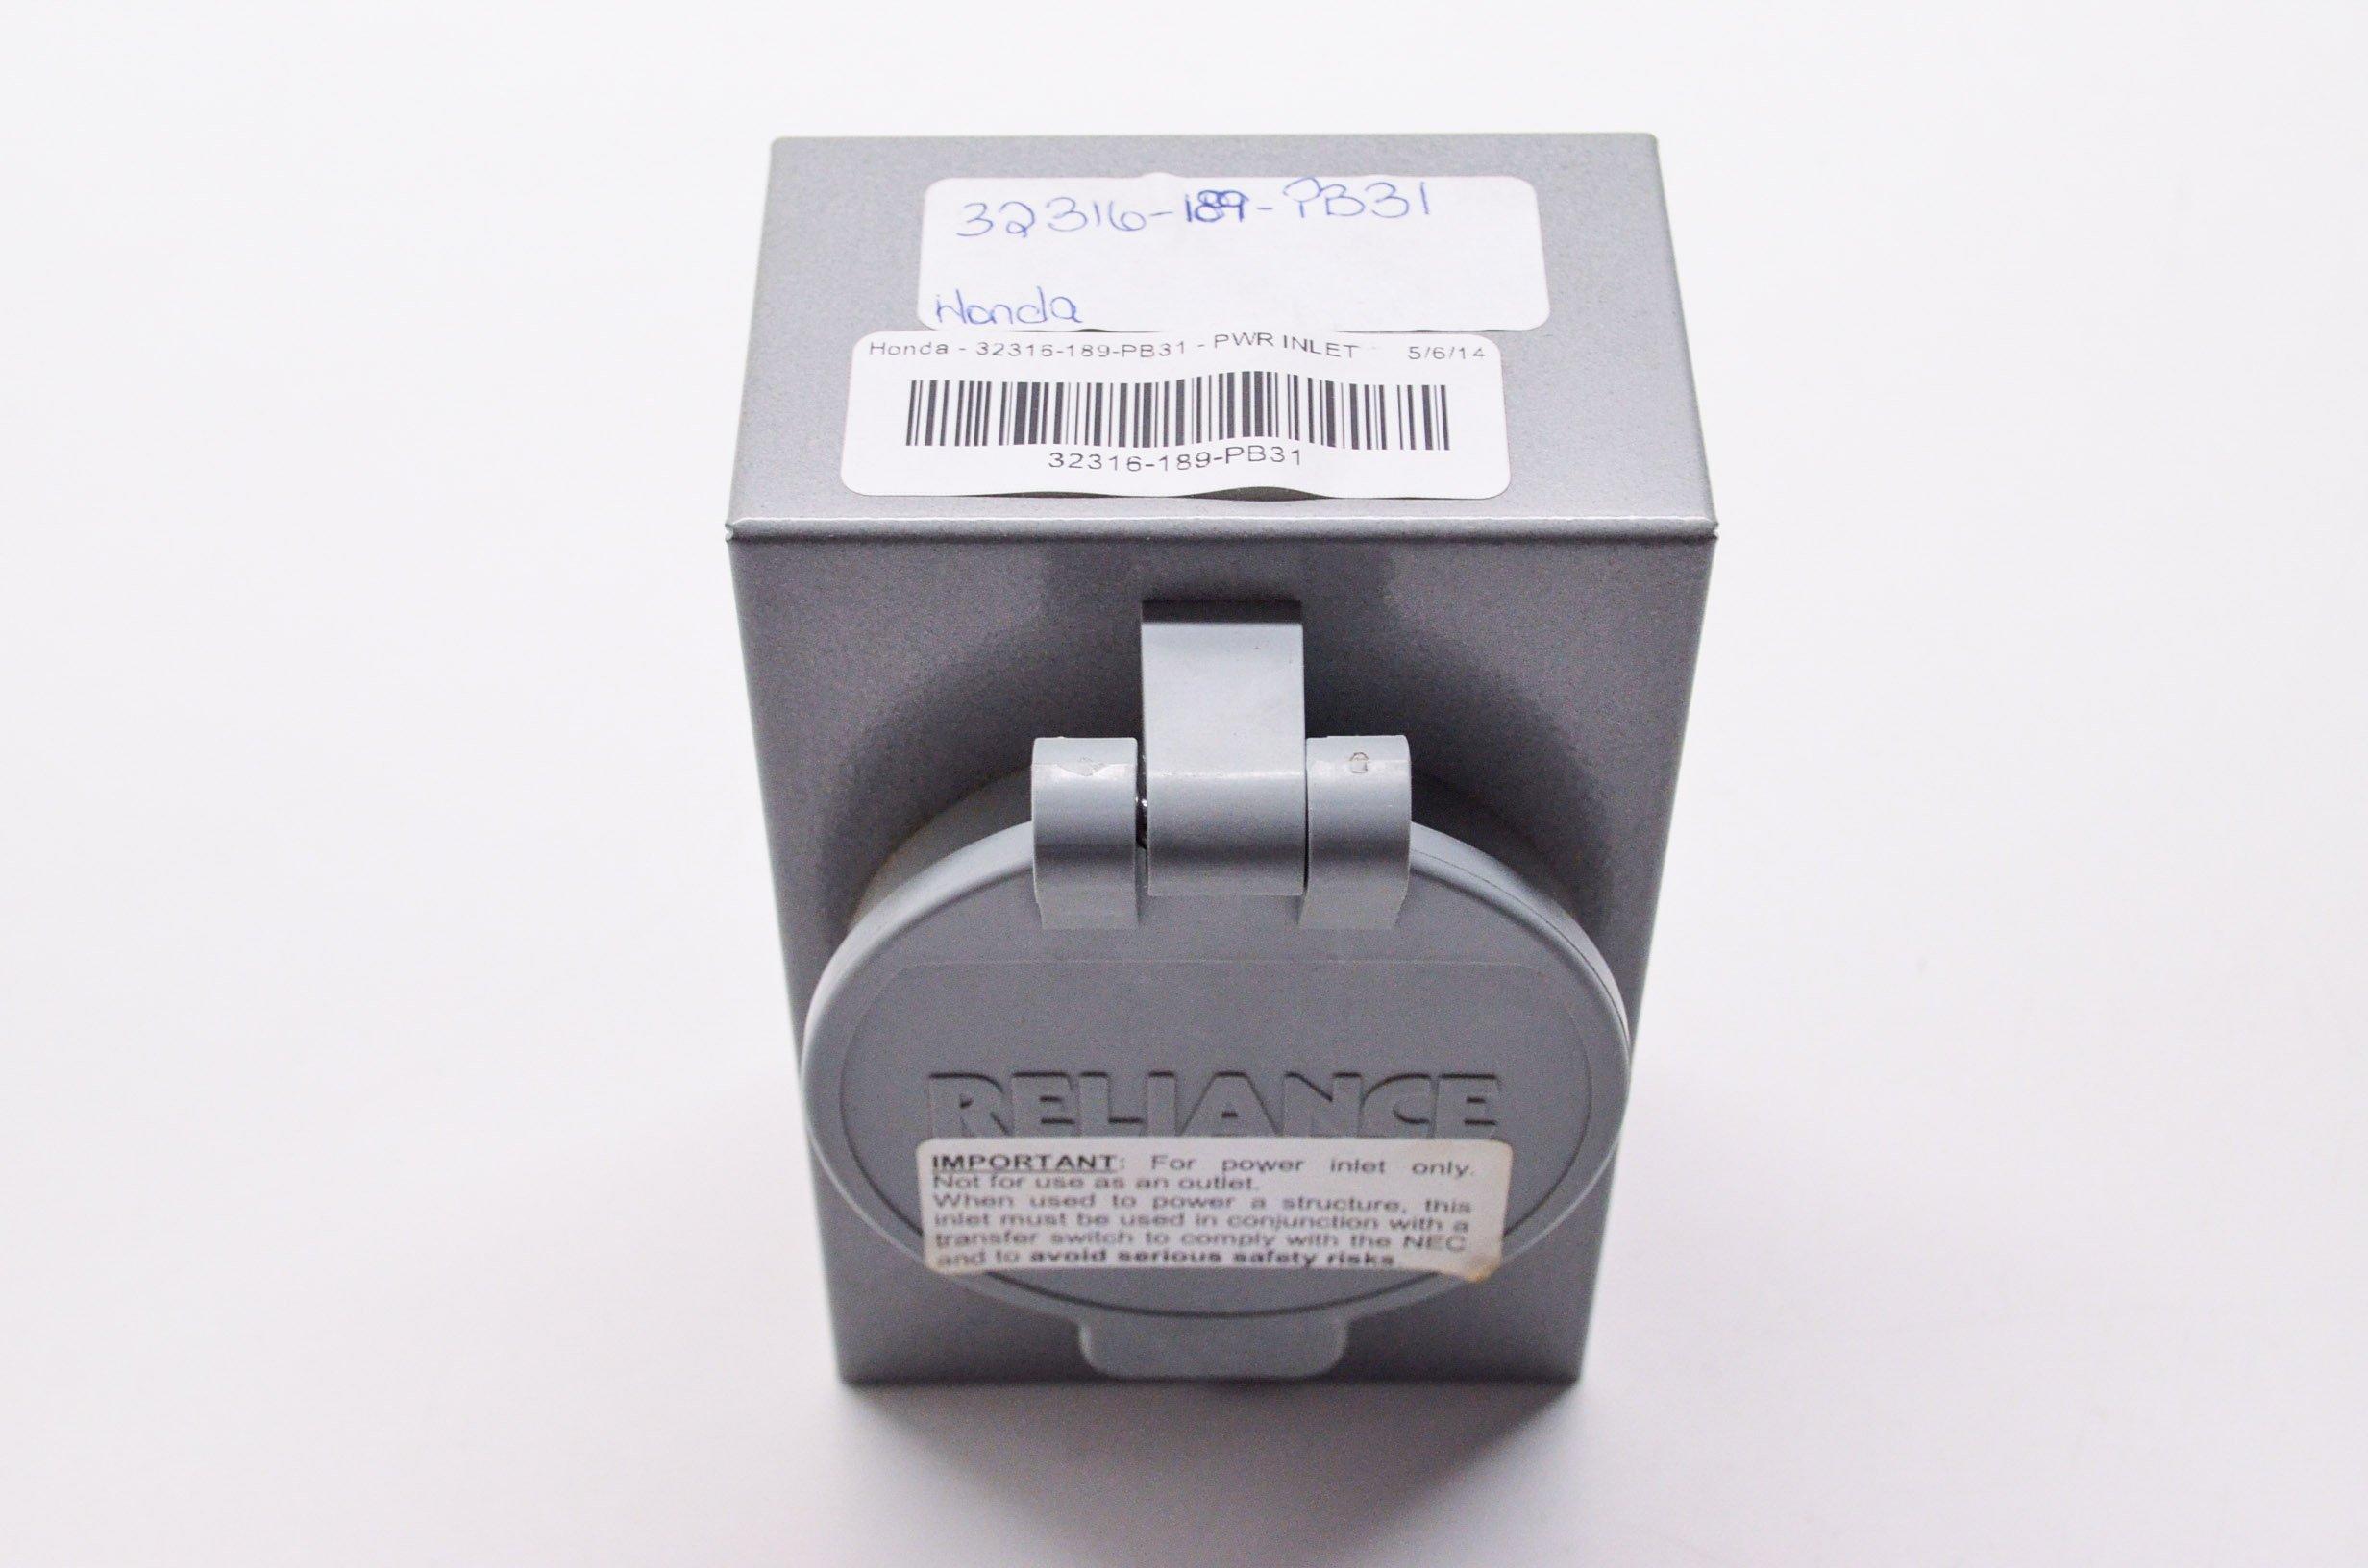 Honda 32316-189-PB31 Pwr Inlet Box,L5-30; 32316189PB31 Made by Honda